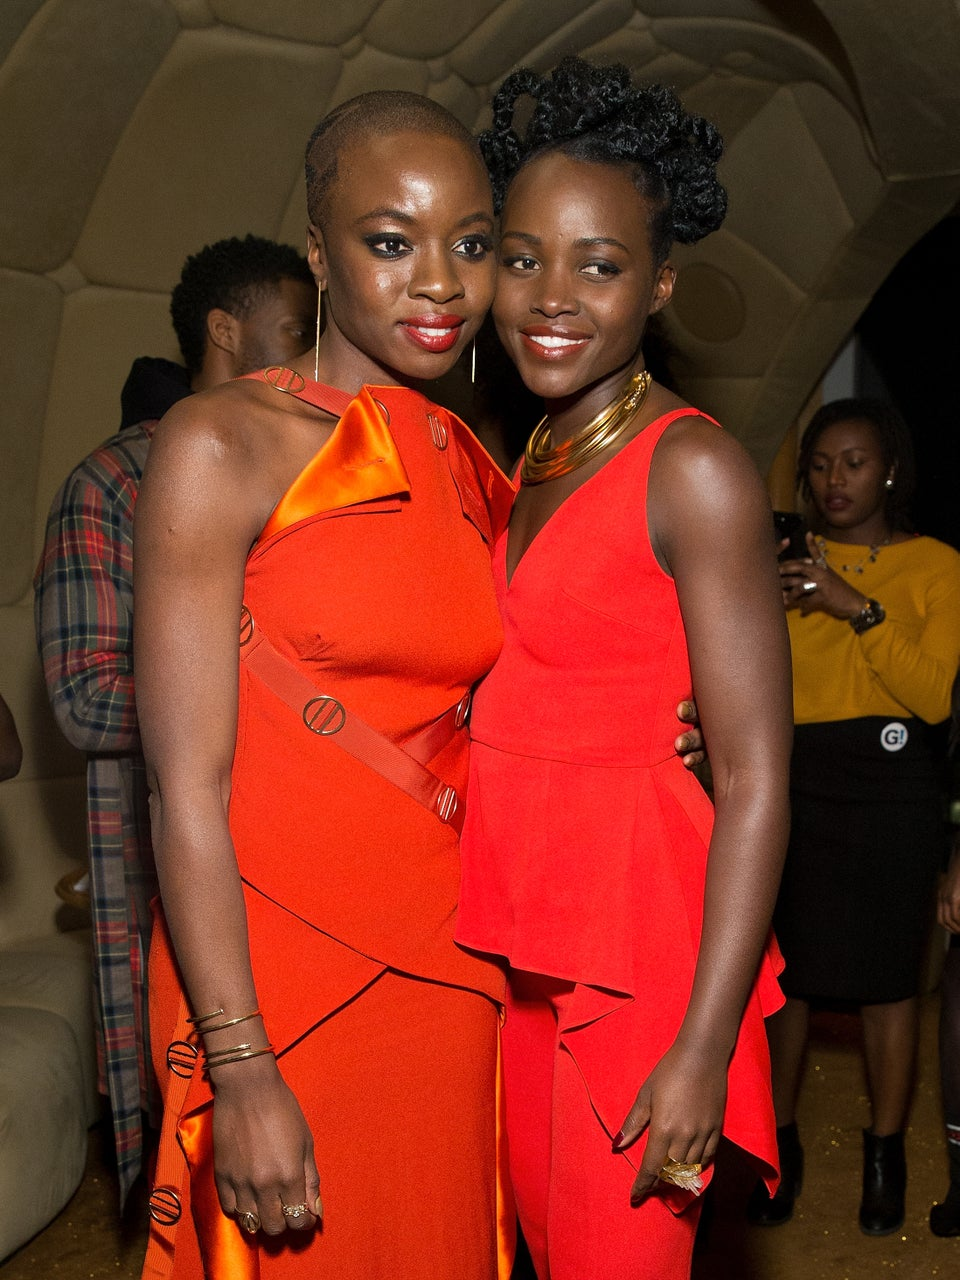 VIDEO: Danai Gurira Had The Whole #BlackWomenInHollywood Audience Singing Happy Birthday To Lupita Nyong'o